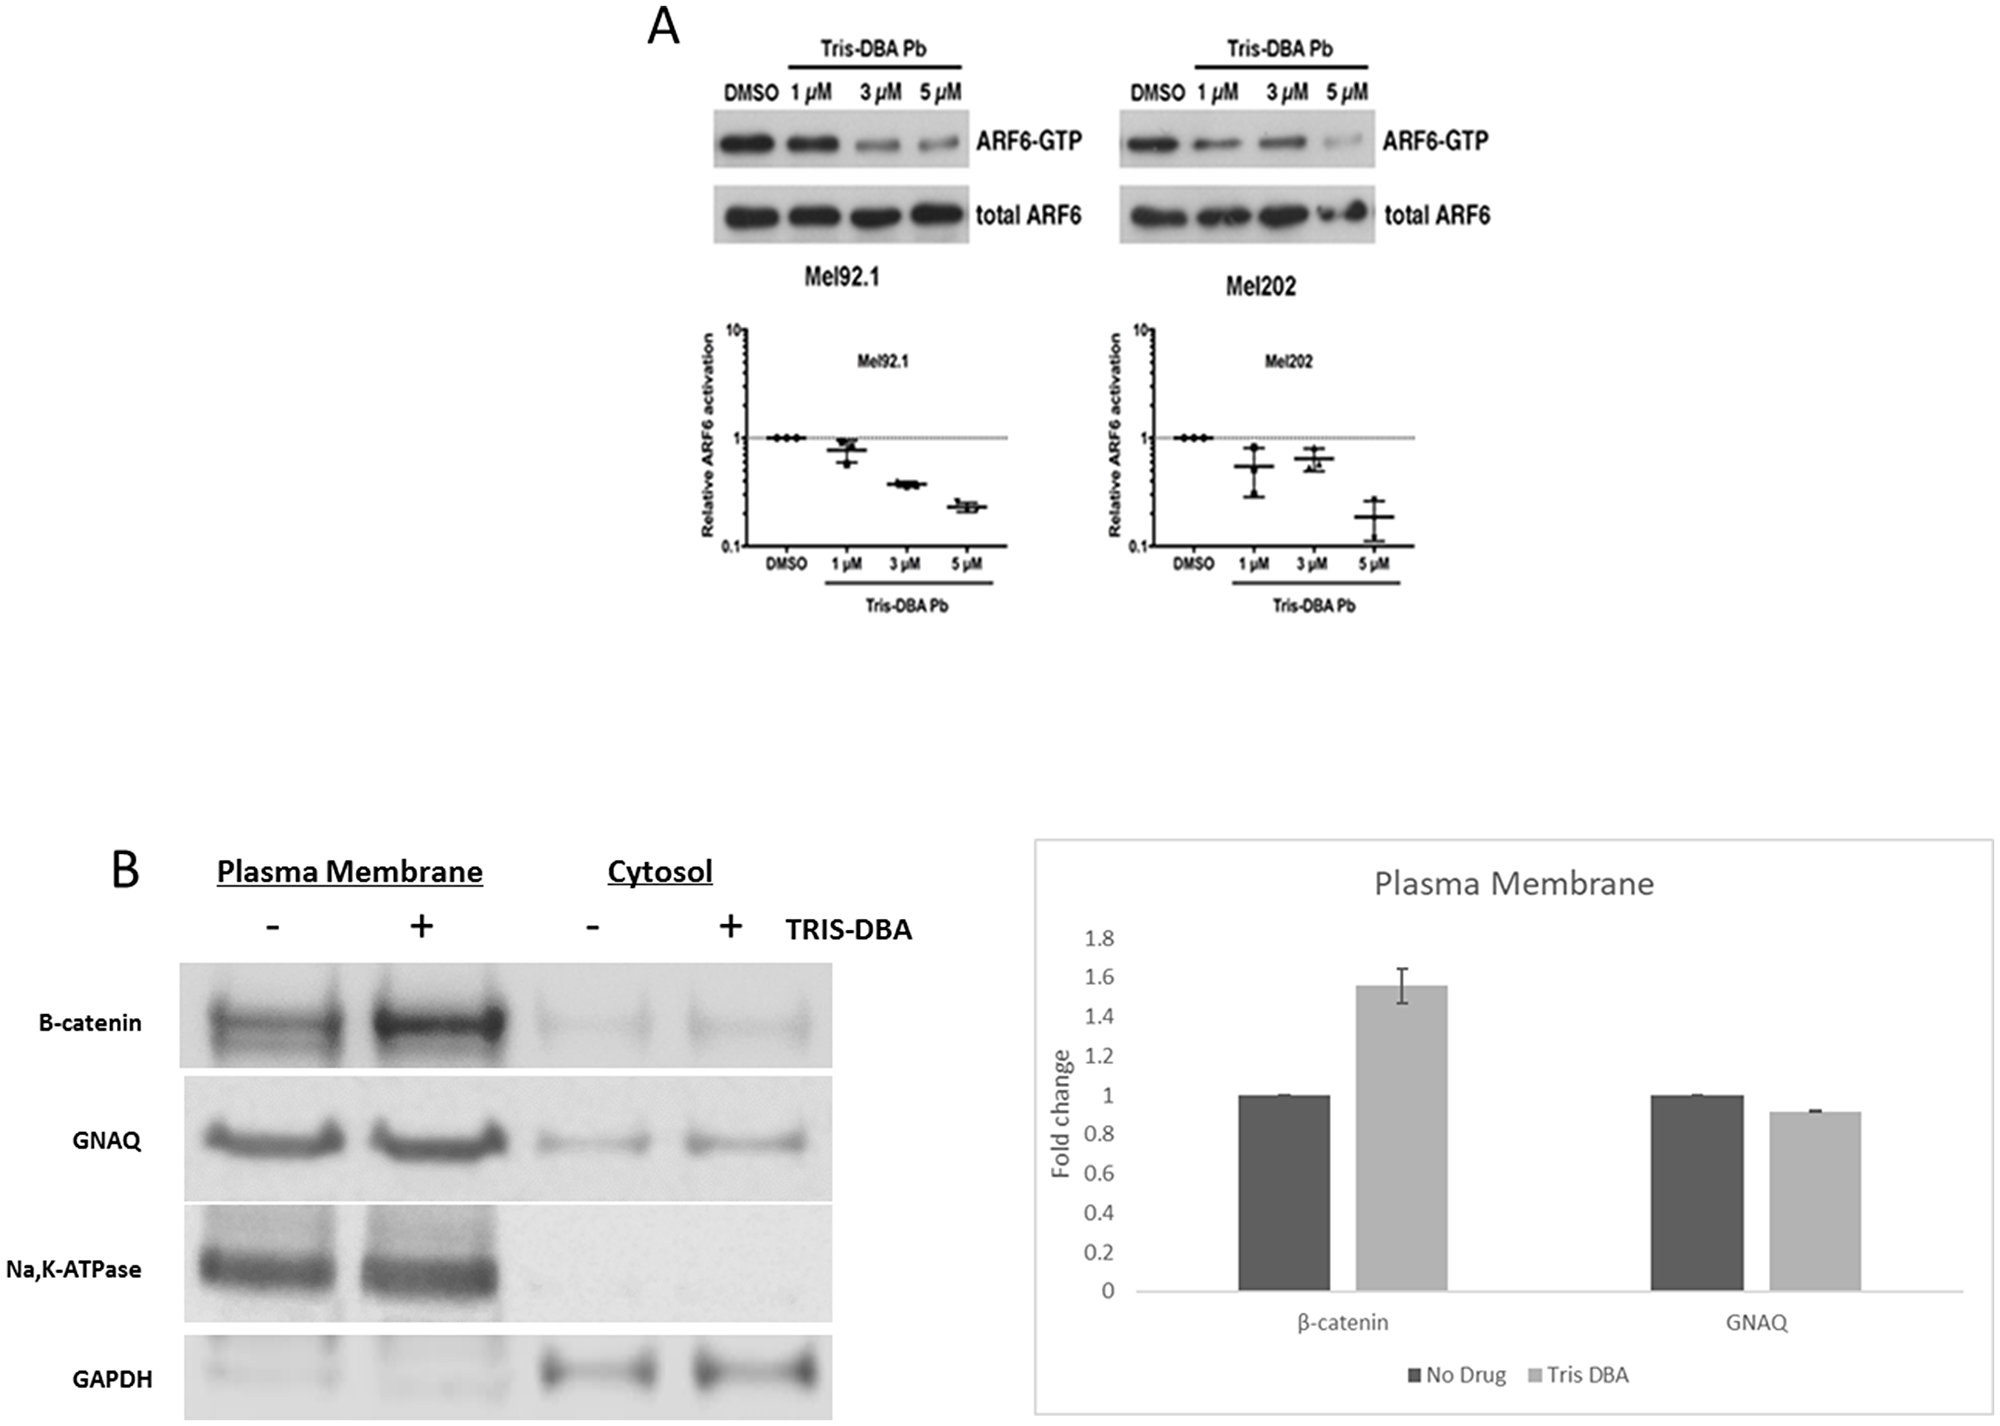 Tris DBA inhibits ARF6 activity and localizes B-catenin to plasma membrane.